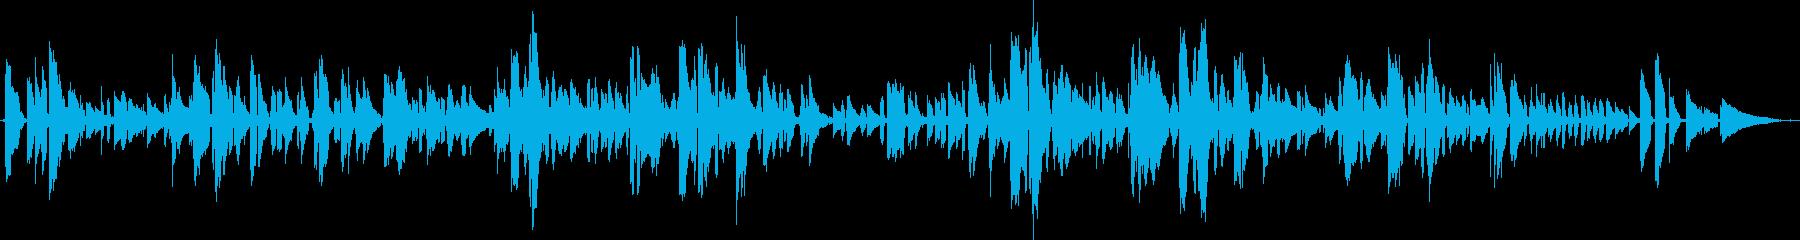 vo.とgt.デュオ しっとりした歌の再生済みの波形